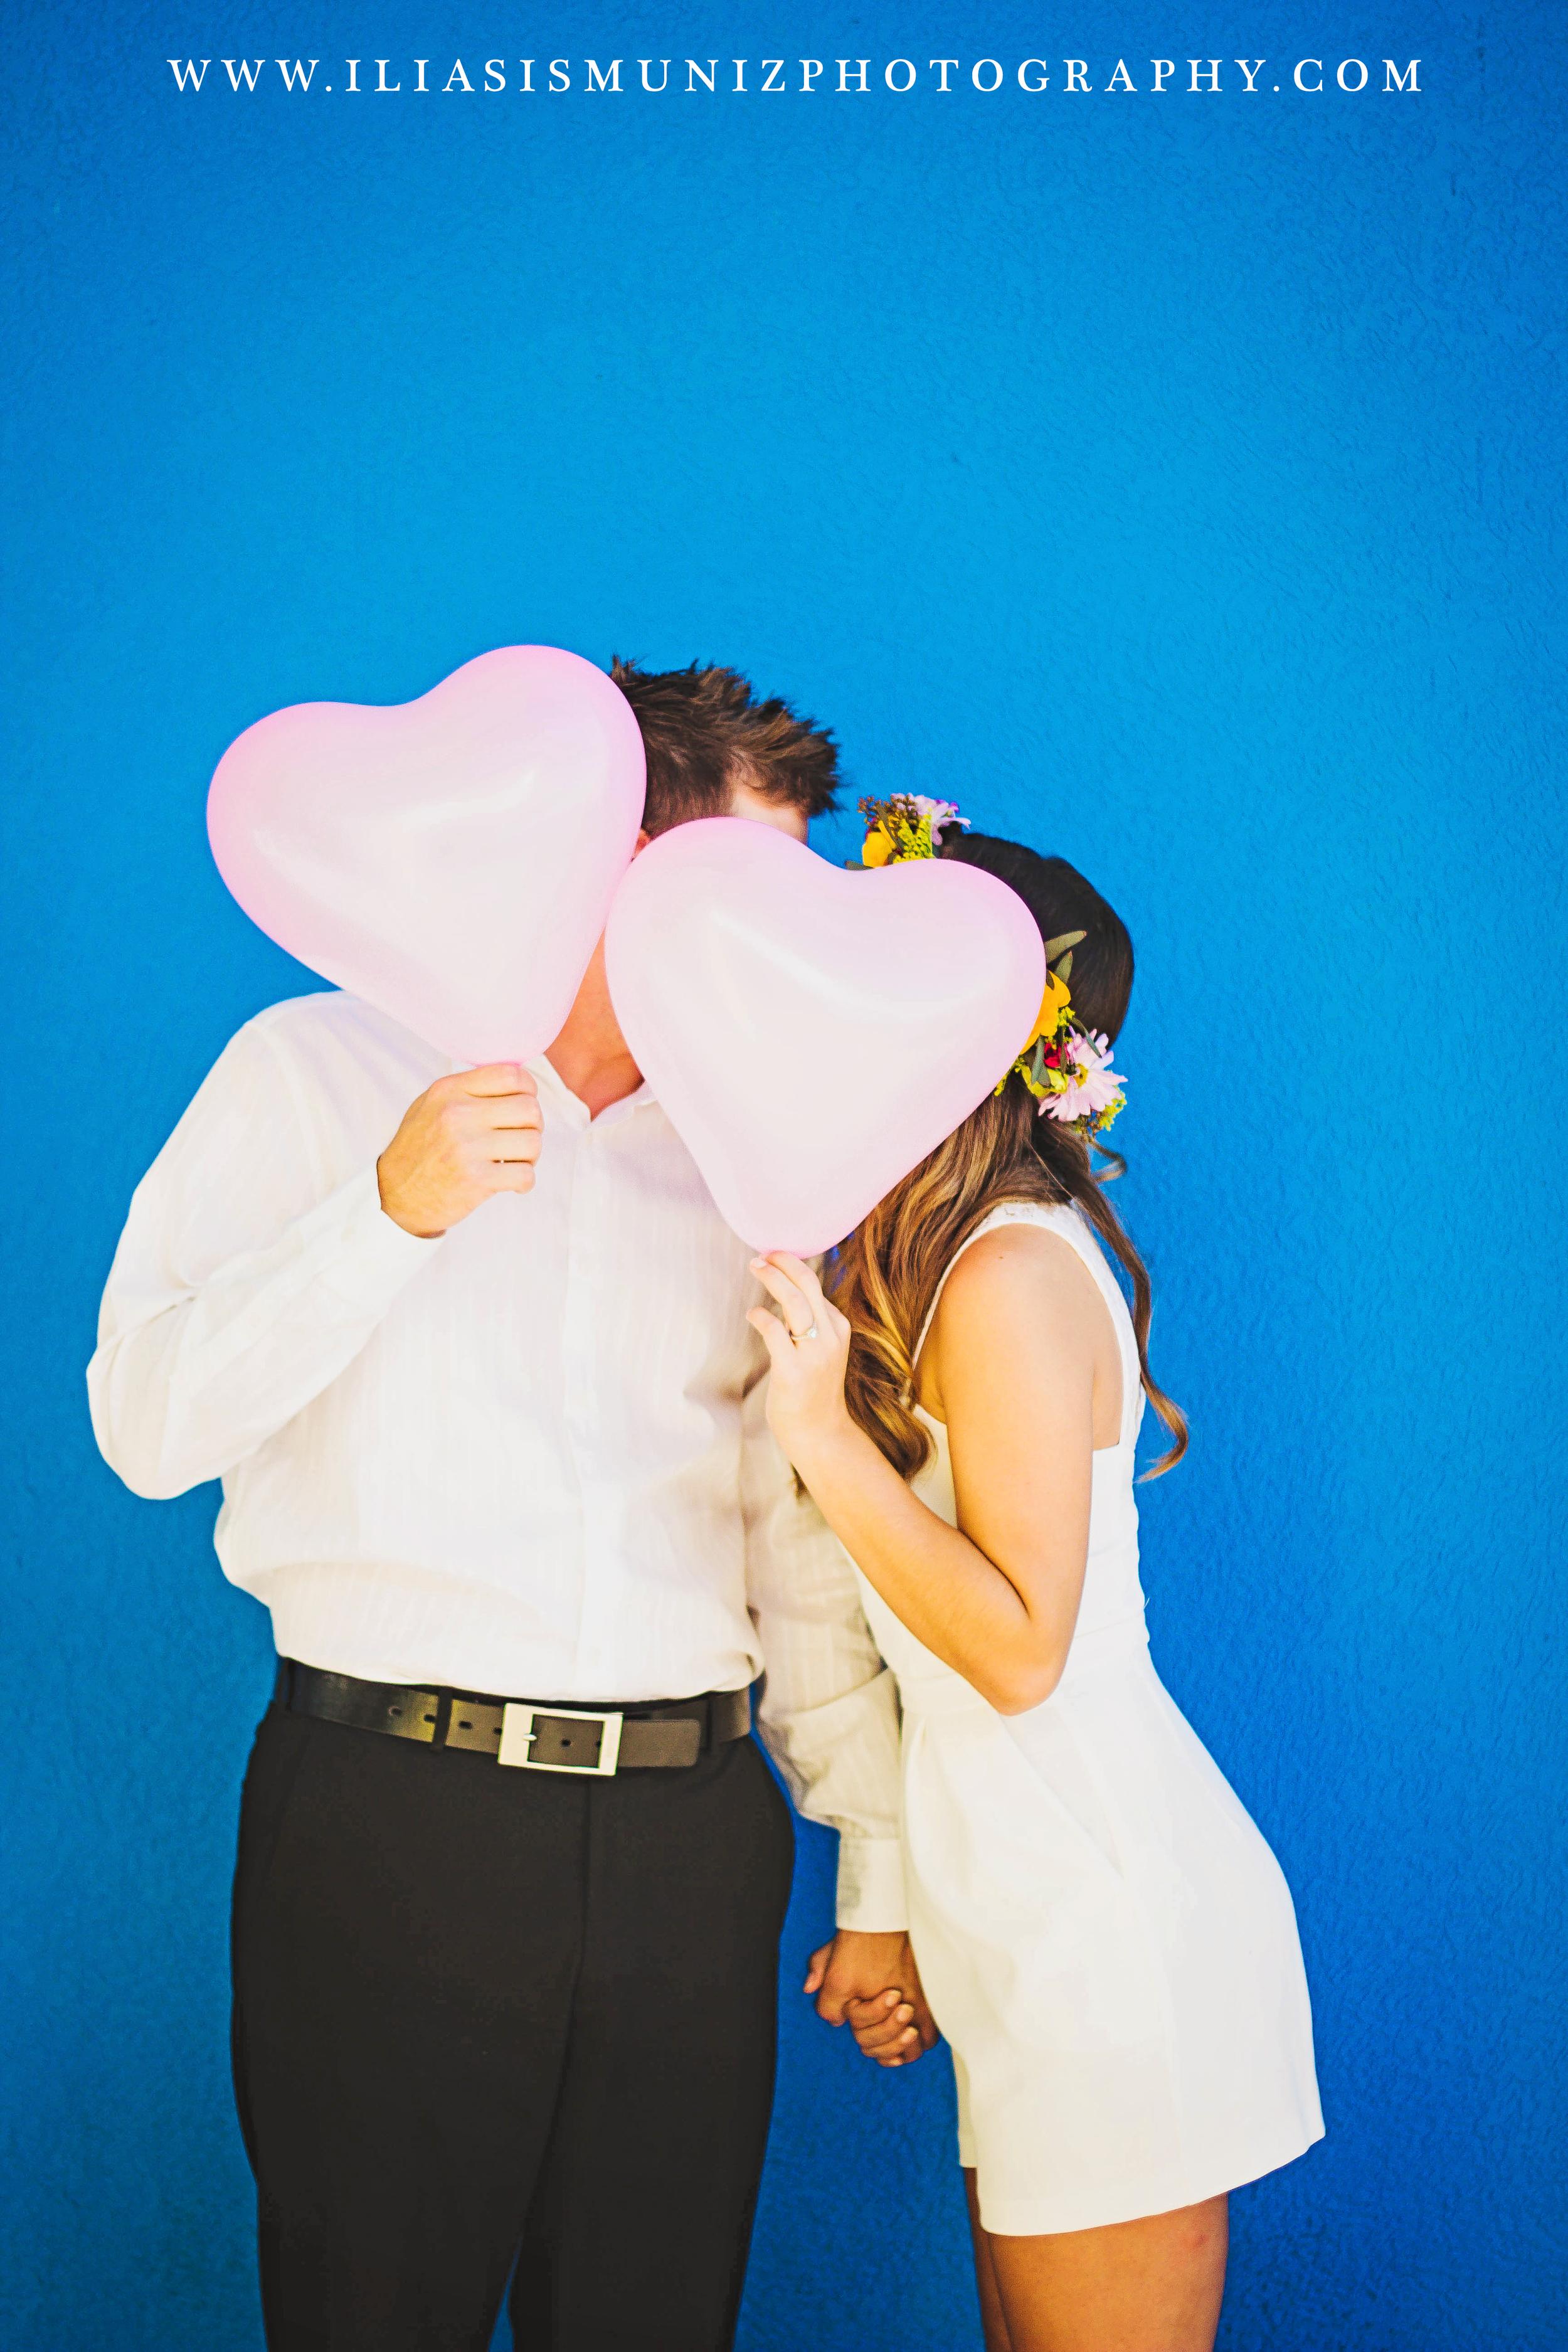 Heart Shaped Balloons | South Padre Island Engagement Shoot